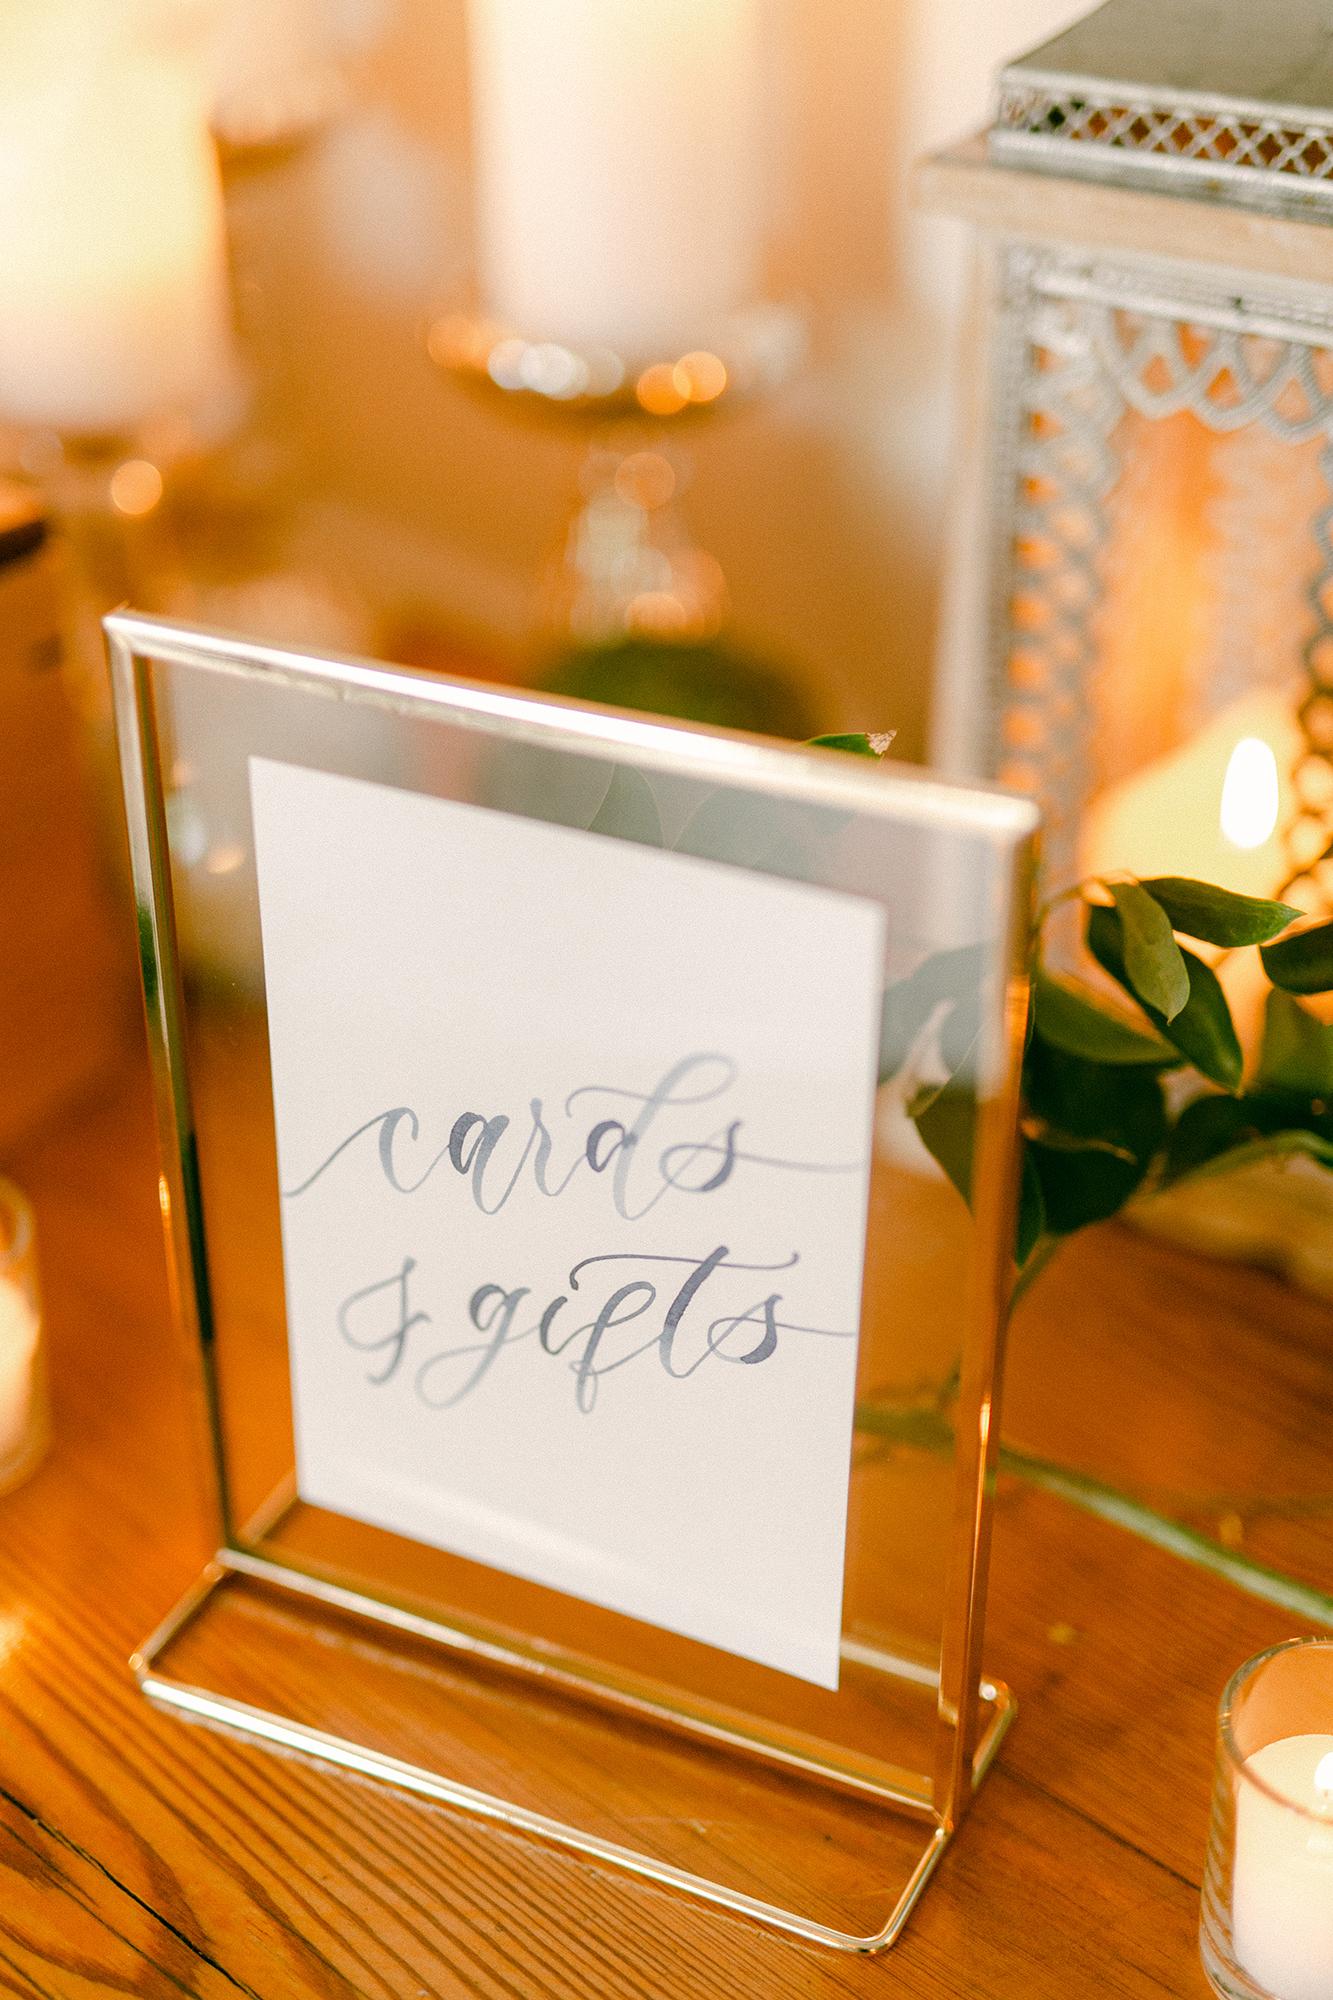 Emily+Brett_RylandInn0580 Sam Allen Creates Watercolor Cards & Gifts sign